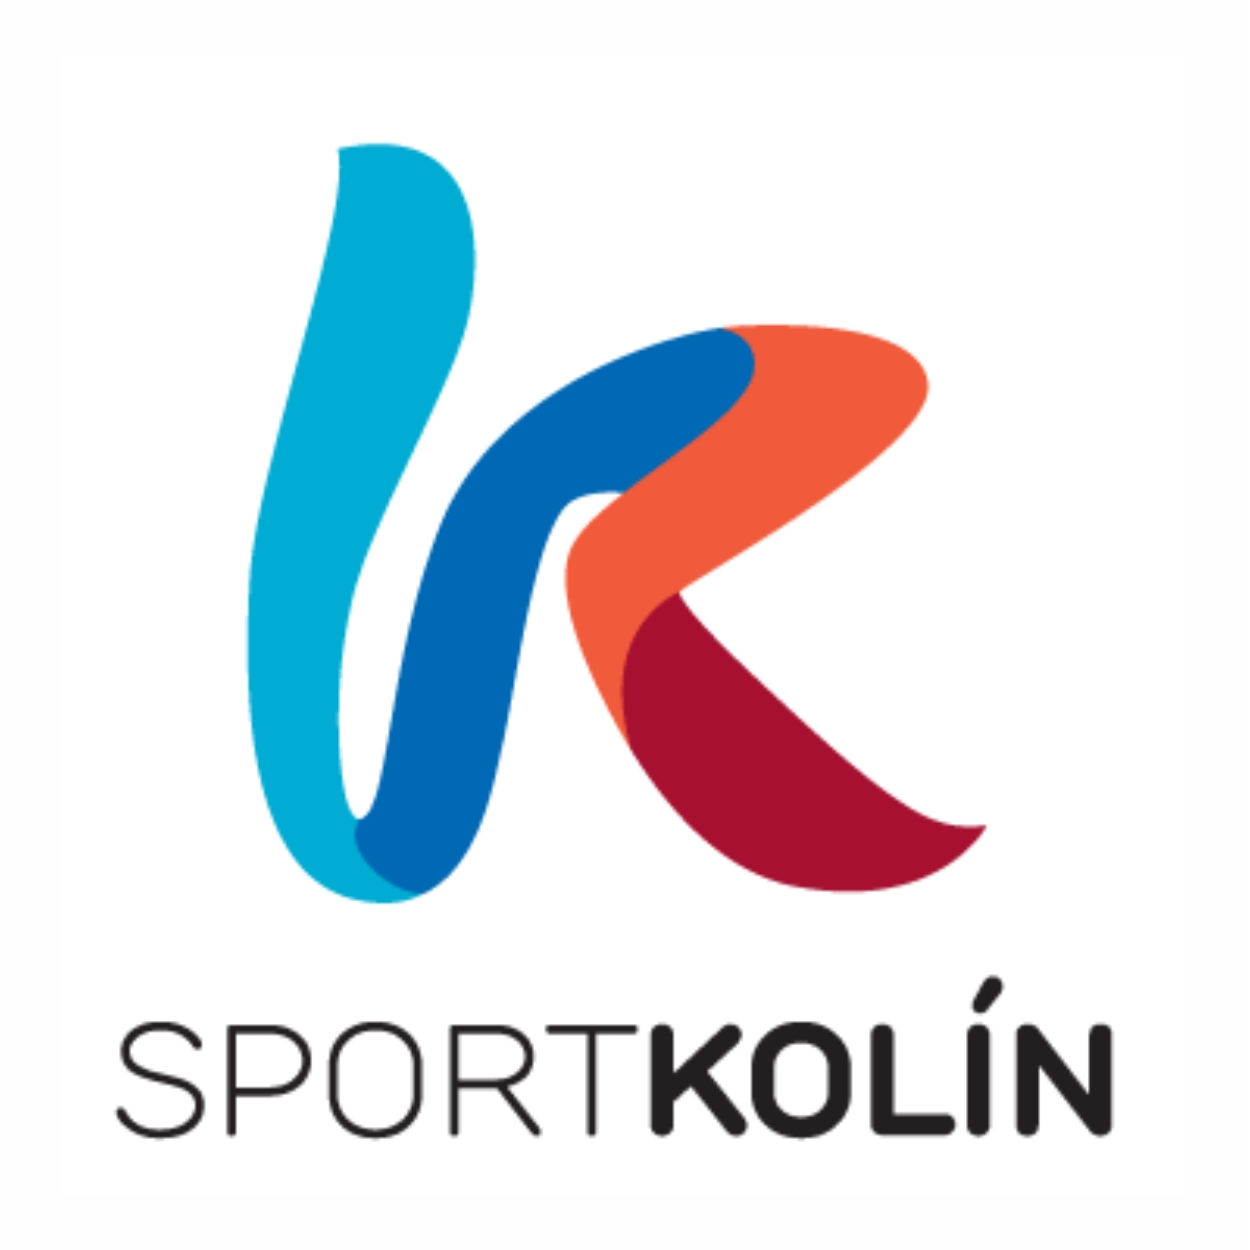 logo sport kolin